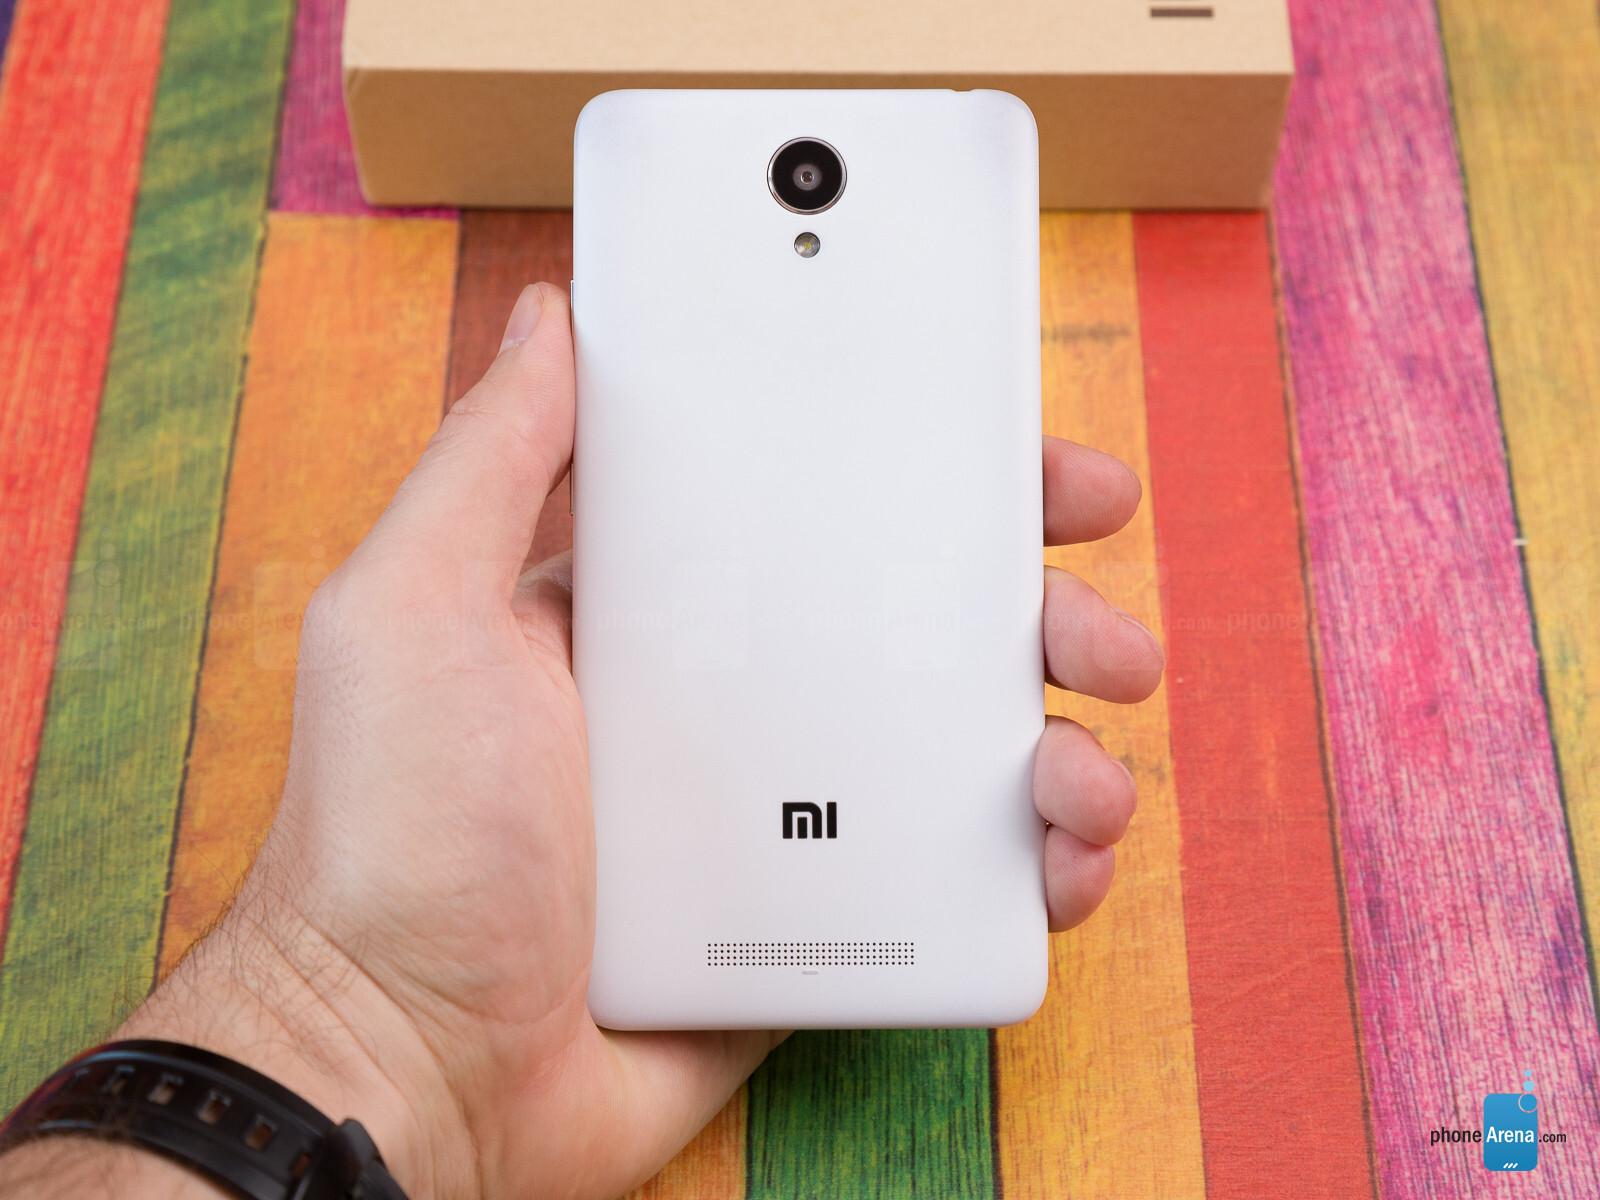 Xiaomi Redmi Note 4 Review The Best Redmi Note Yet: Xiaomi Redmi Note 2 Review